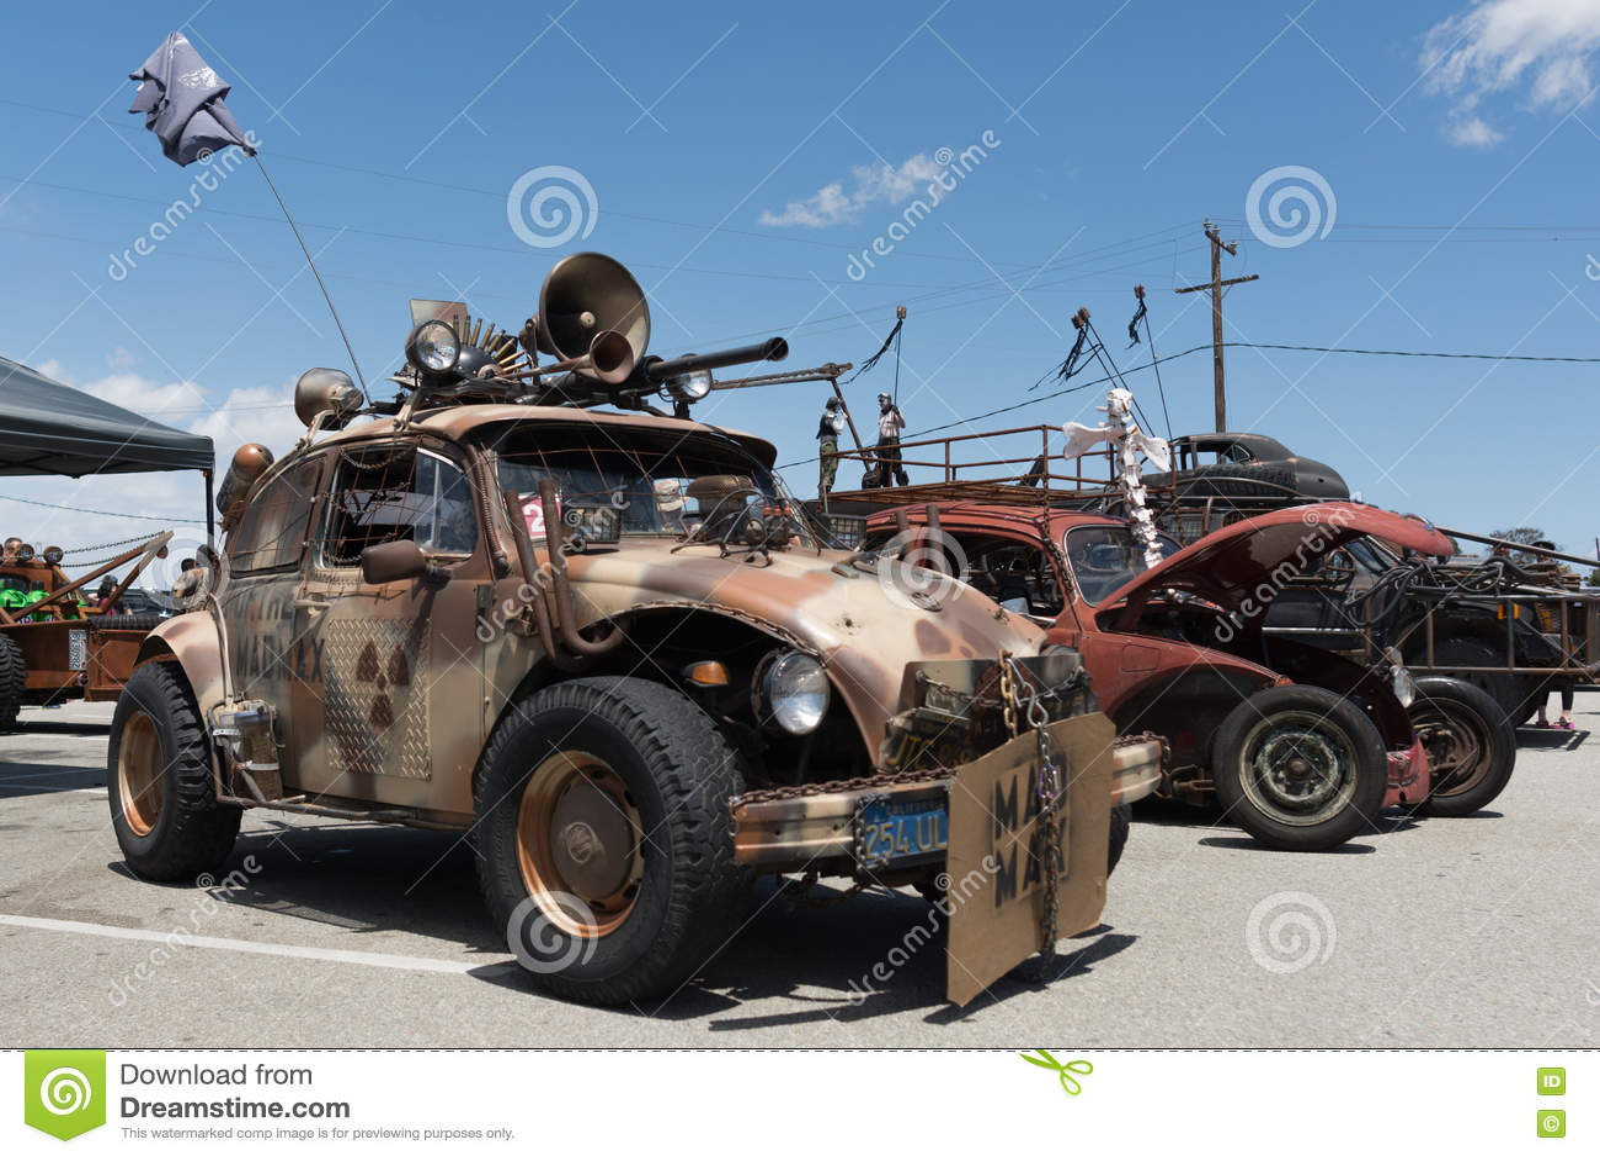 volkswagen beetle post apocalyptic survival vehicle editorial stock photo image